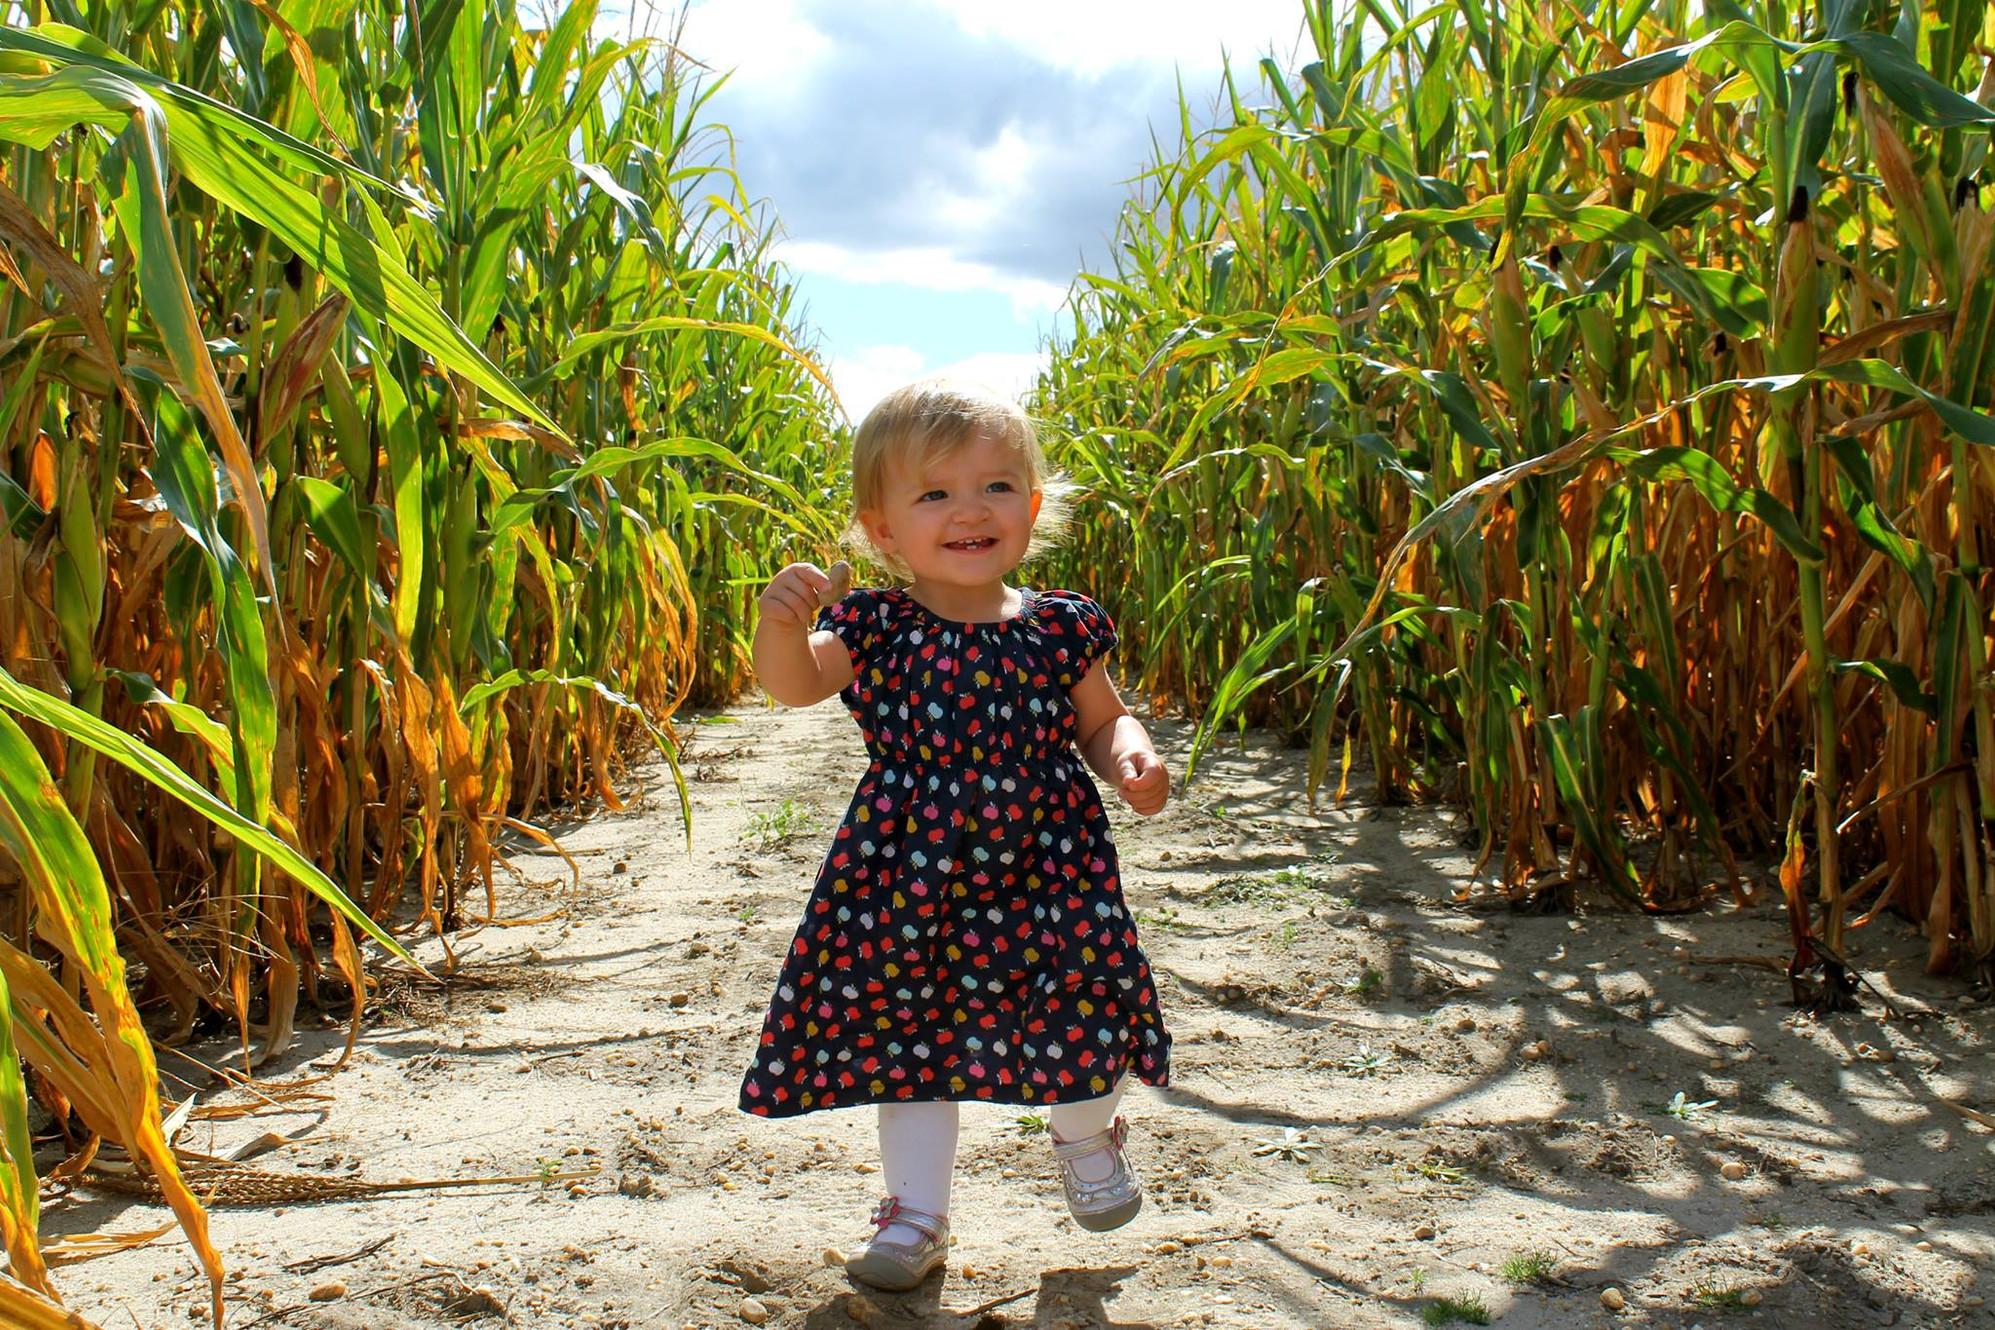 Corn Maze Pumpkin Patch Galloway Twp Nj Sahl S Father Son Farm